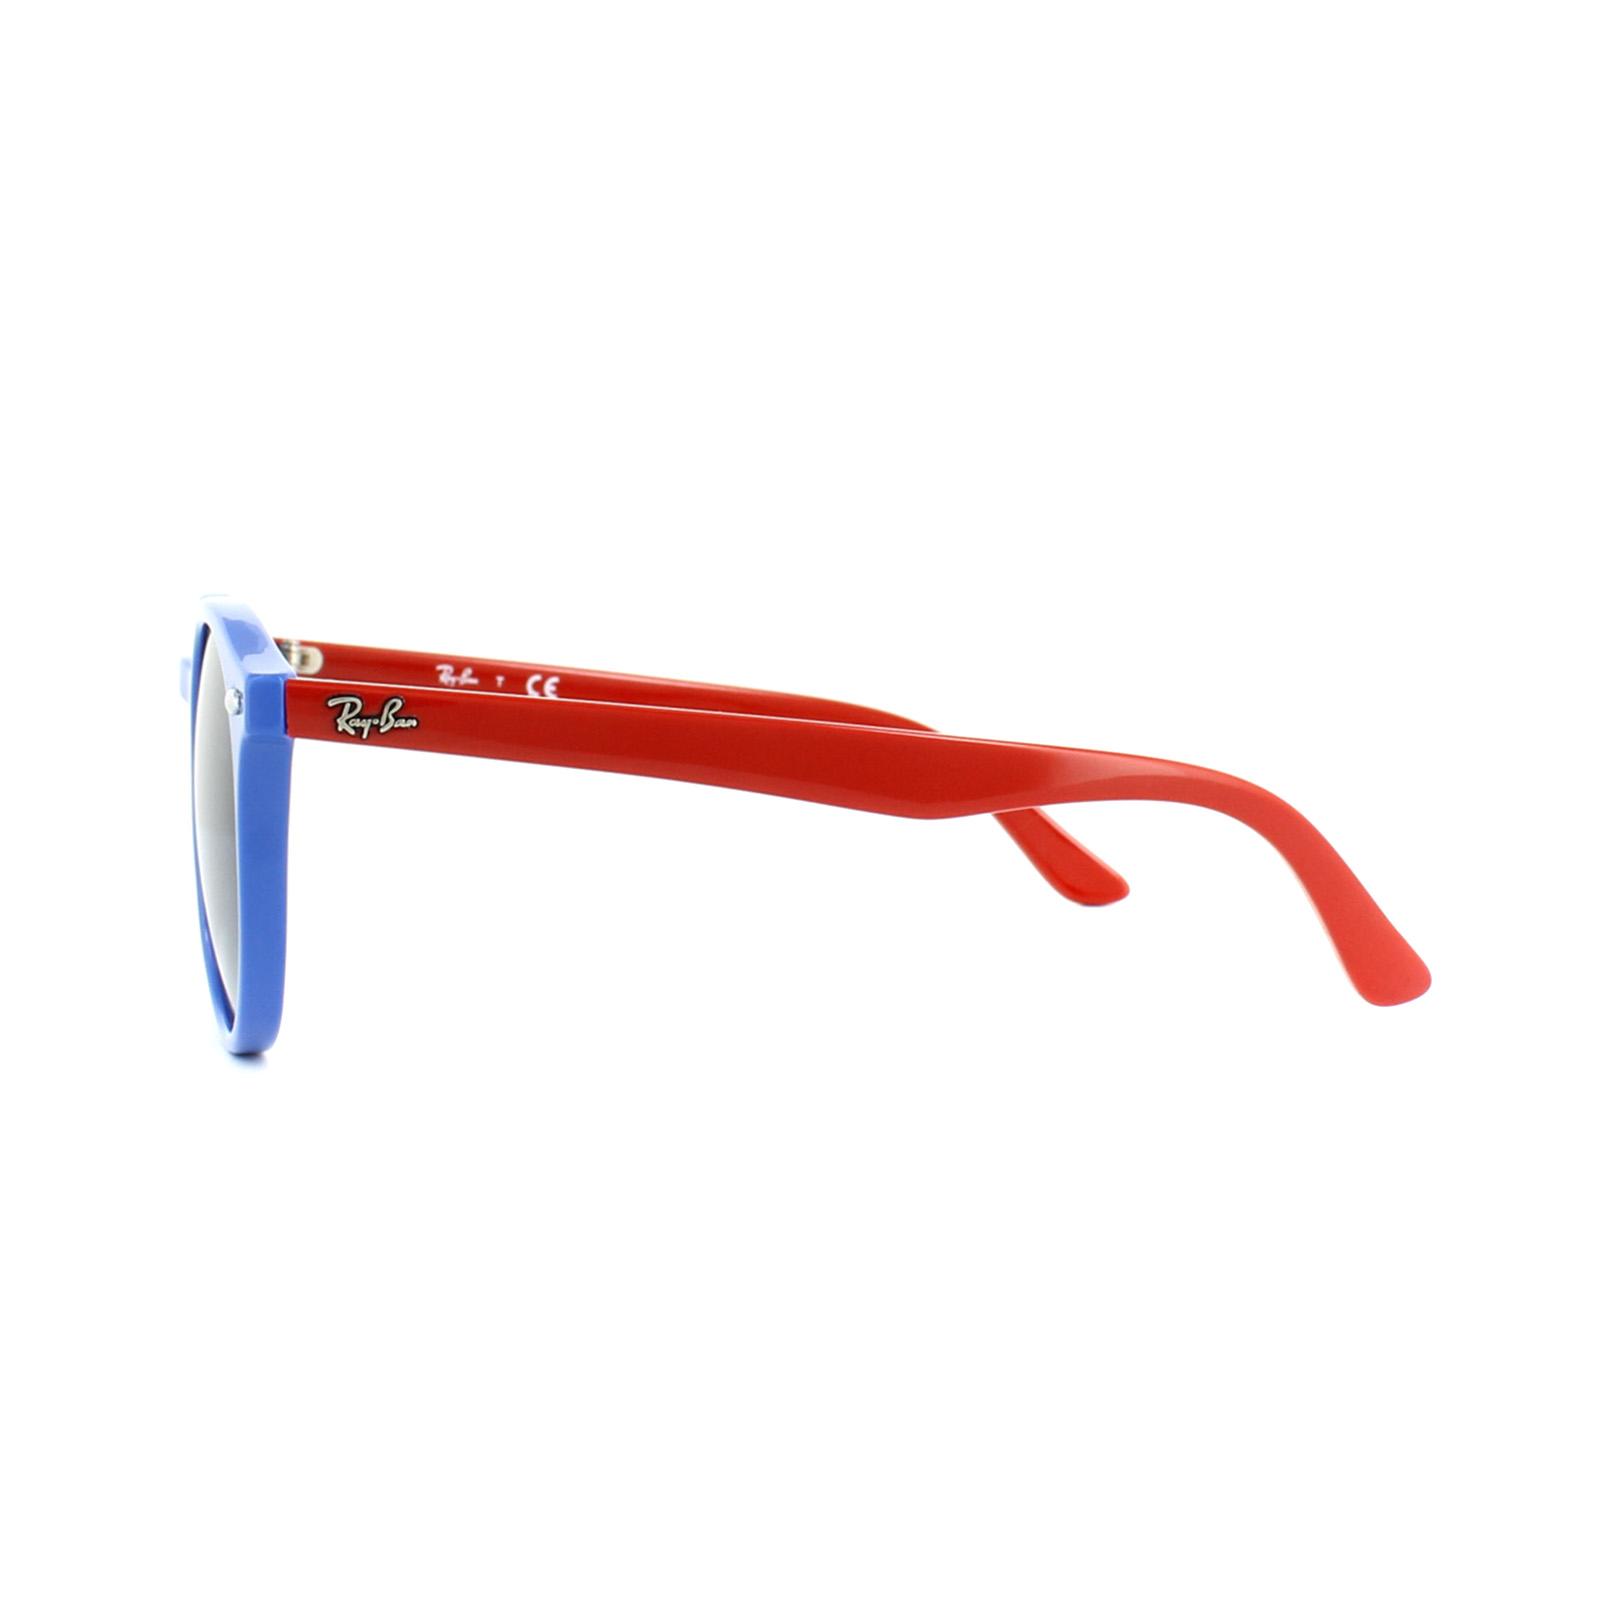 Sentinel Ray-Ban Junior Sunglasses 9064S 70204L Blue Red Blue Gradient d07017e0c3